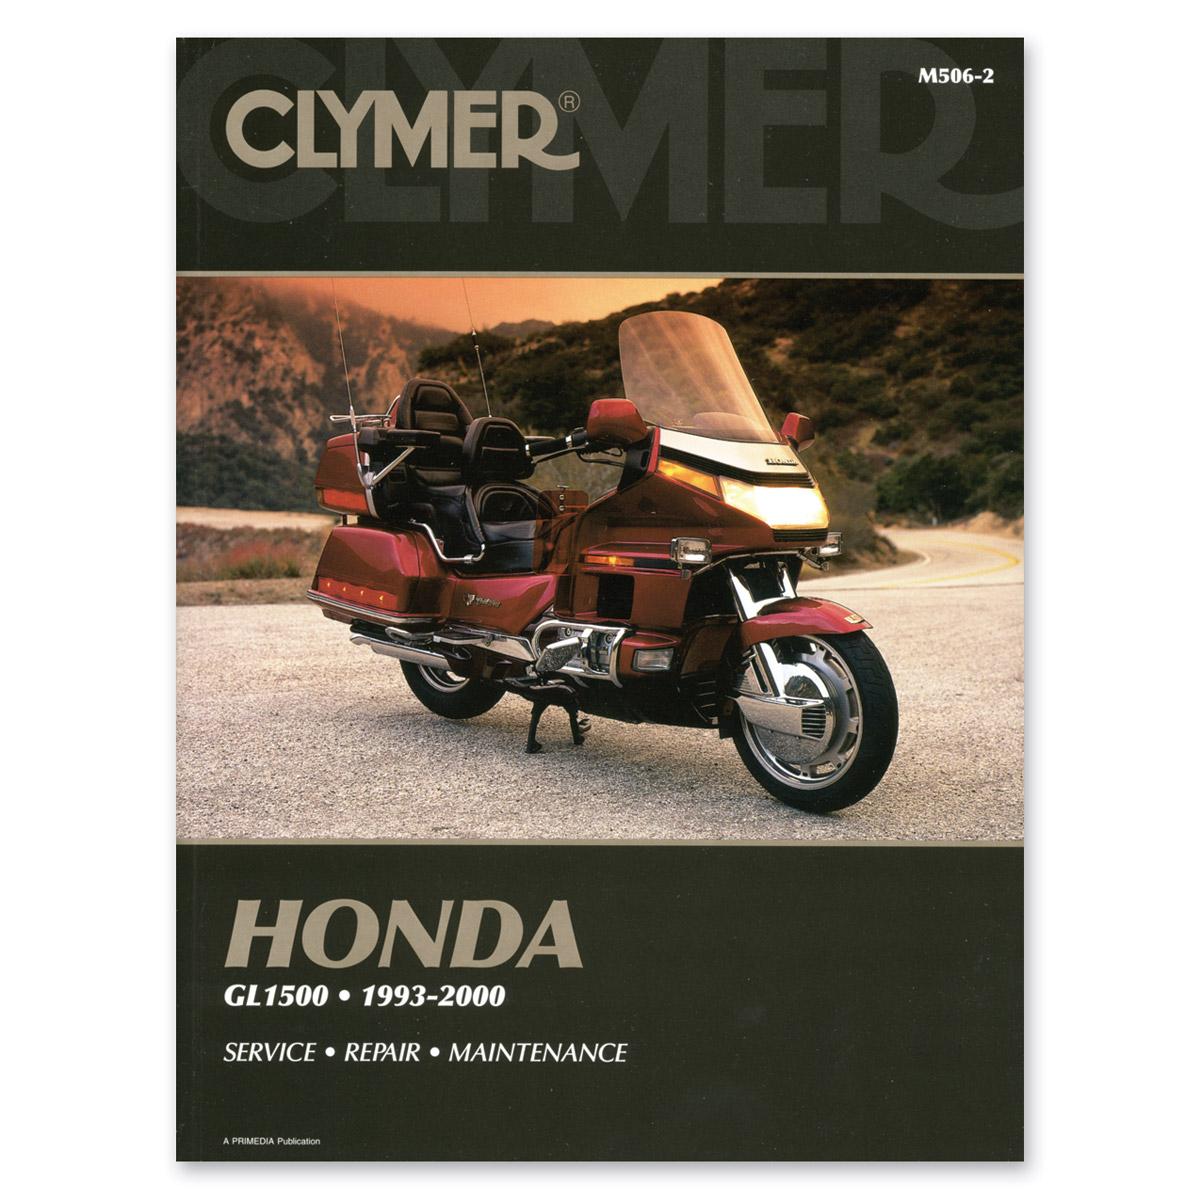 Clymer Honda Gold Wing &Valkyrie Motorcycle Repair Manual